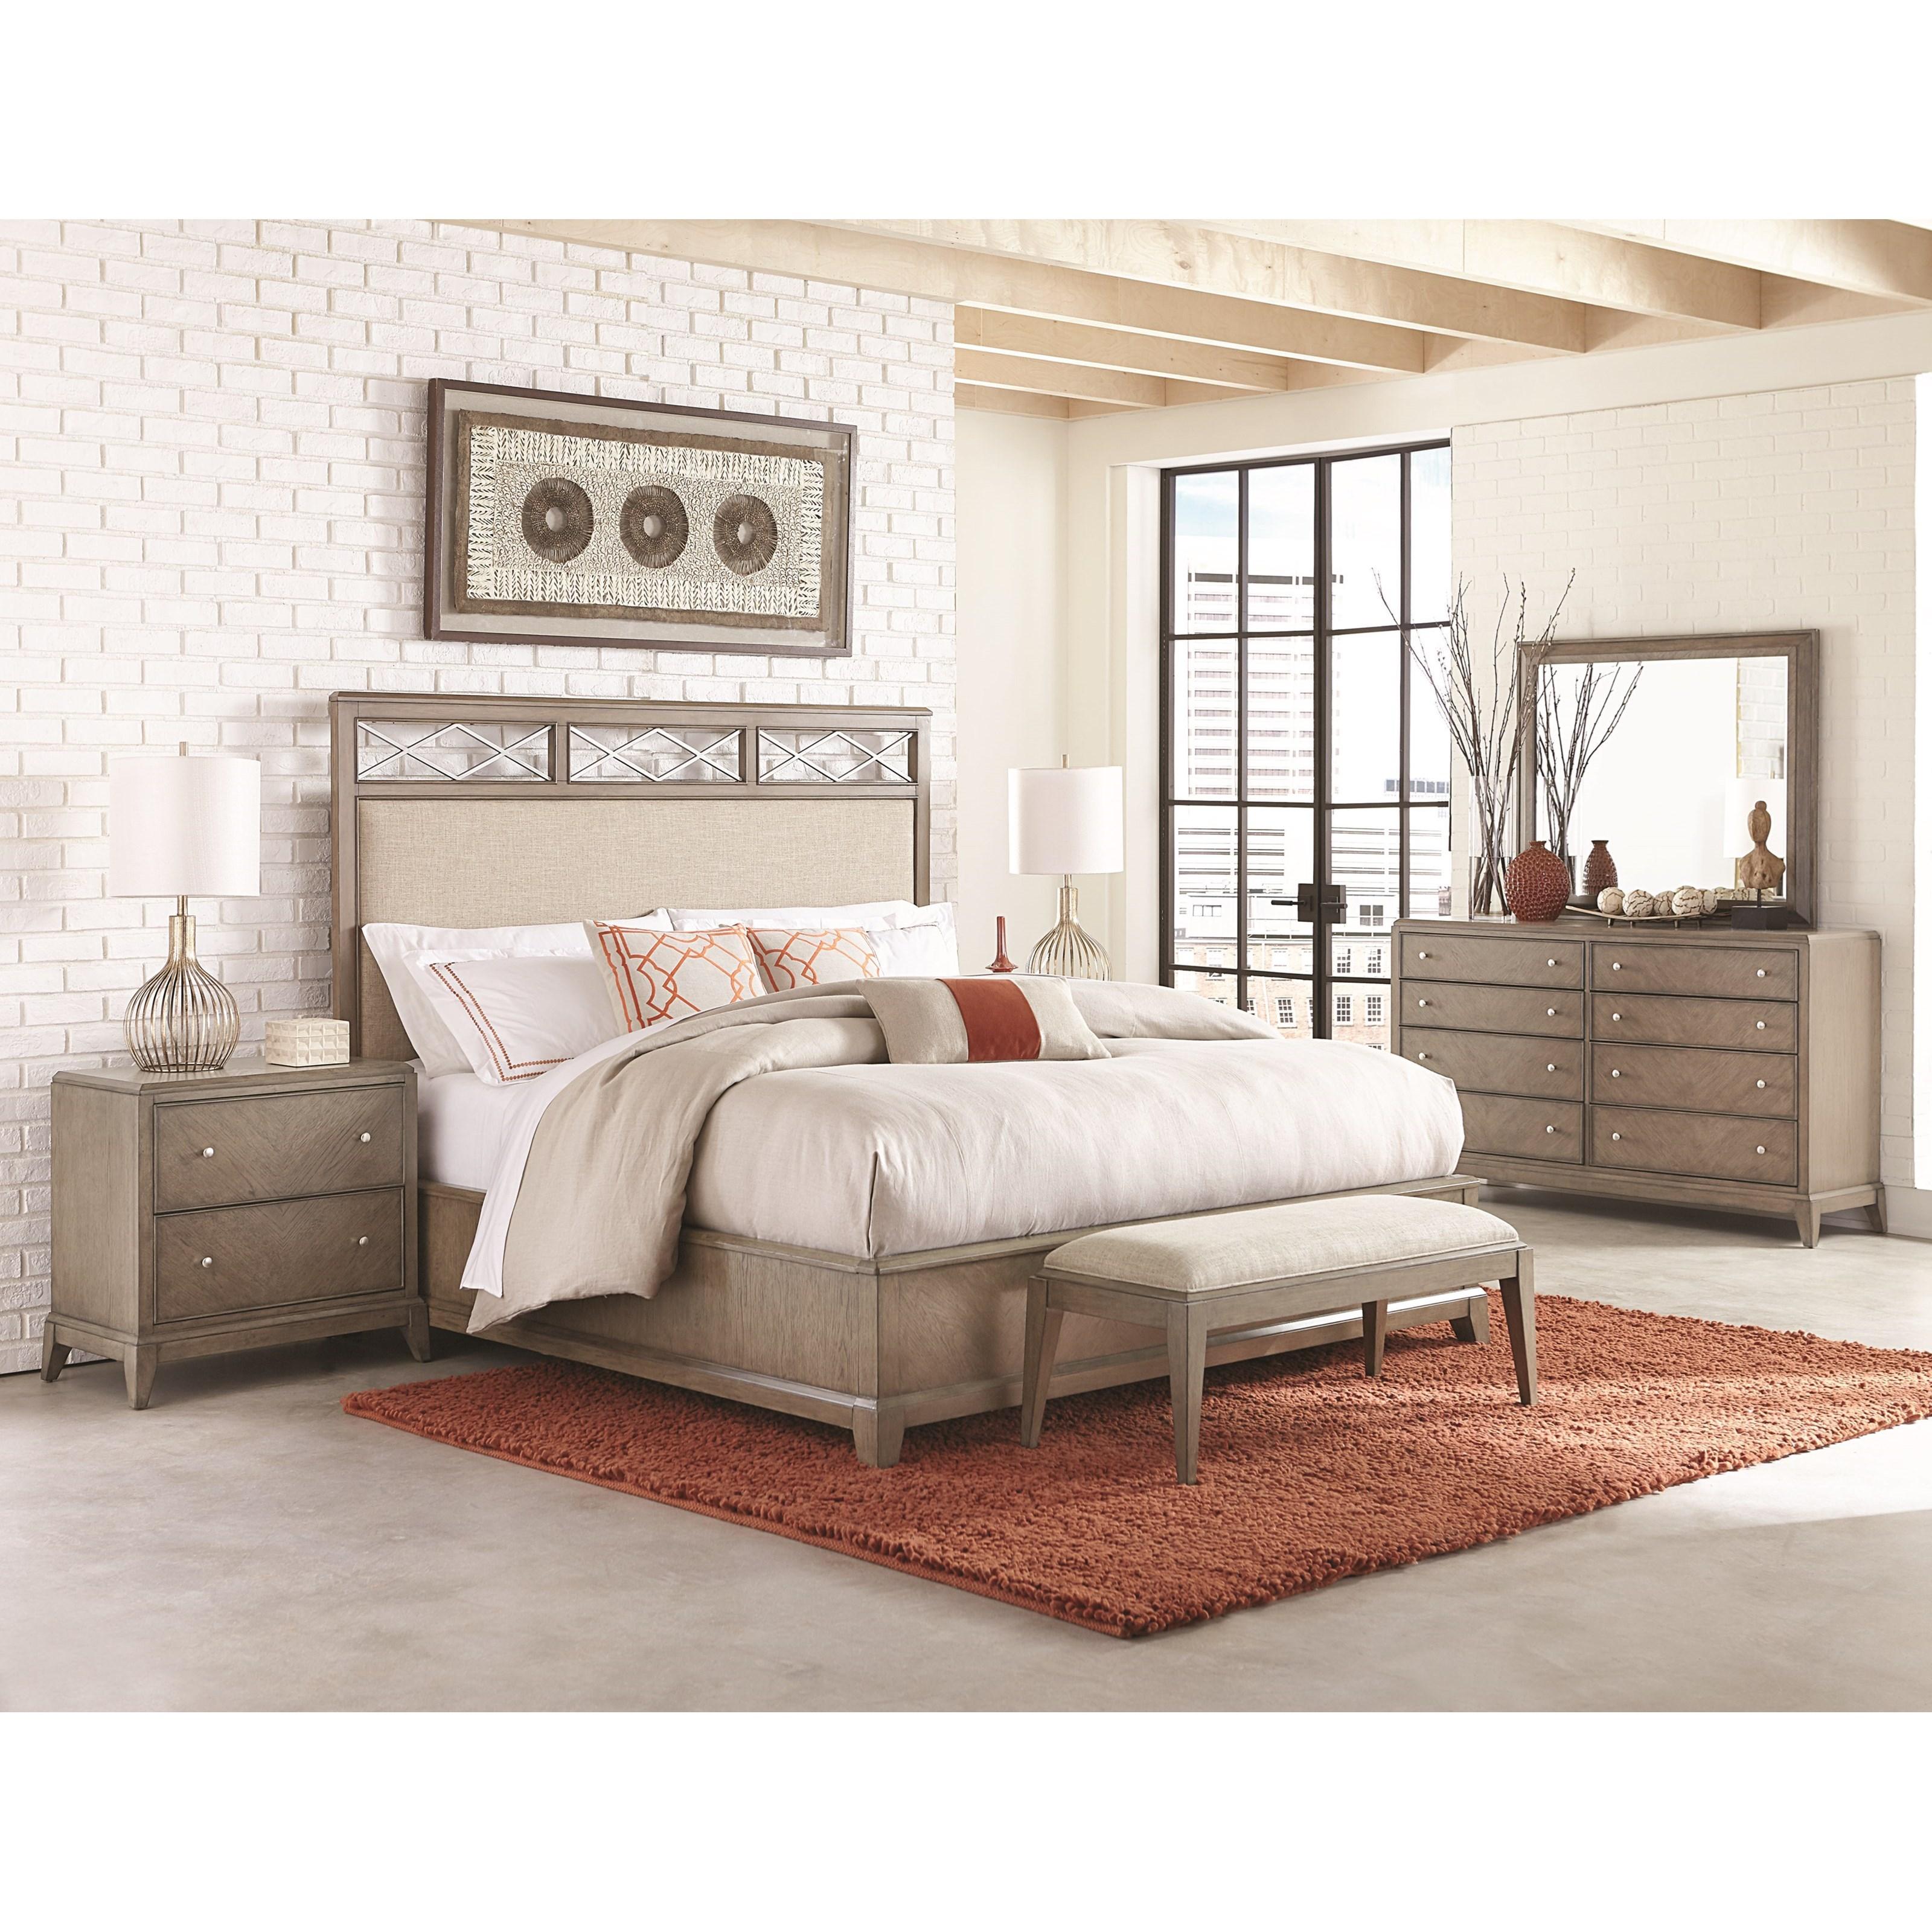 Legacy Classic Apex Queen Bedroom Group - Item Number: 7700 Q Bedroom Group 1